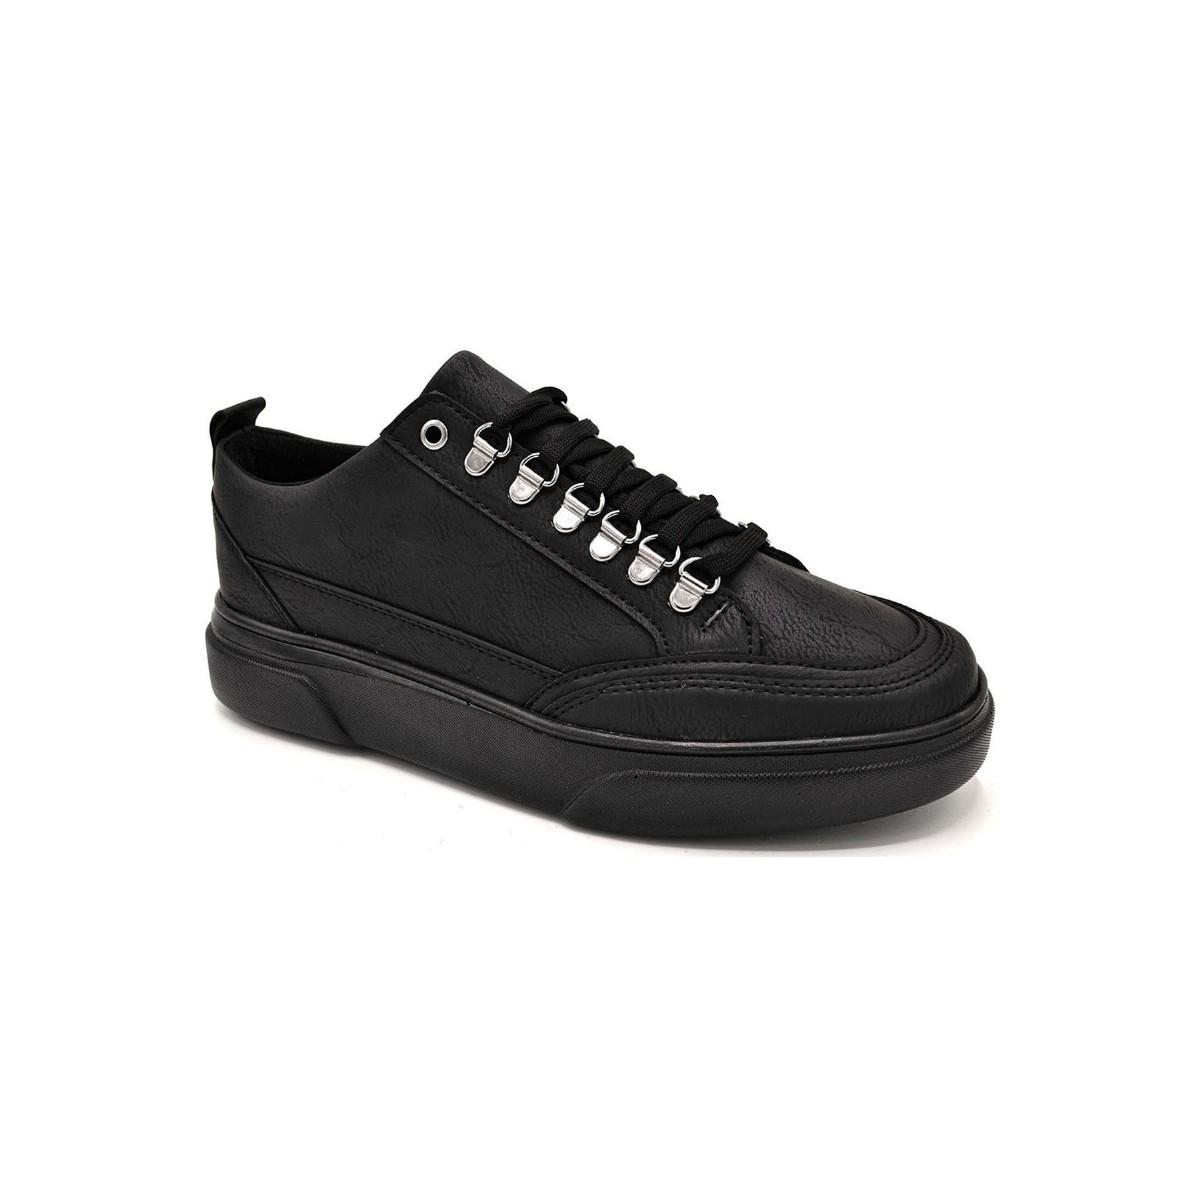 L.A. Polo 104 Siyah Renk Siyah Taban Erkek Spor Ayakkabı